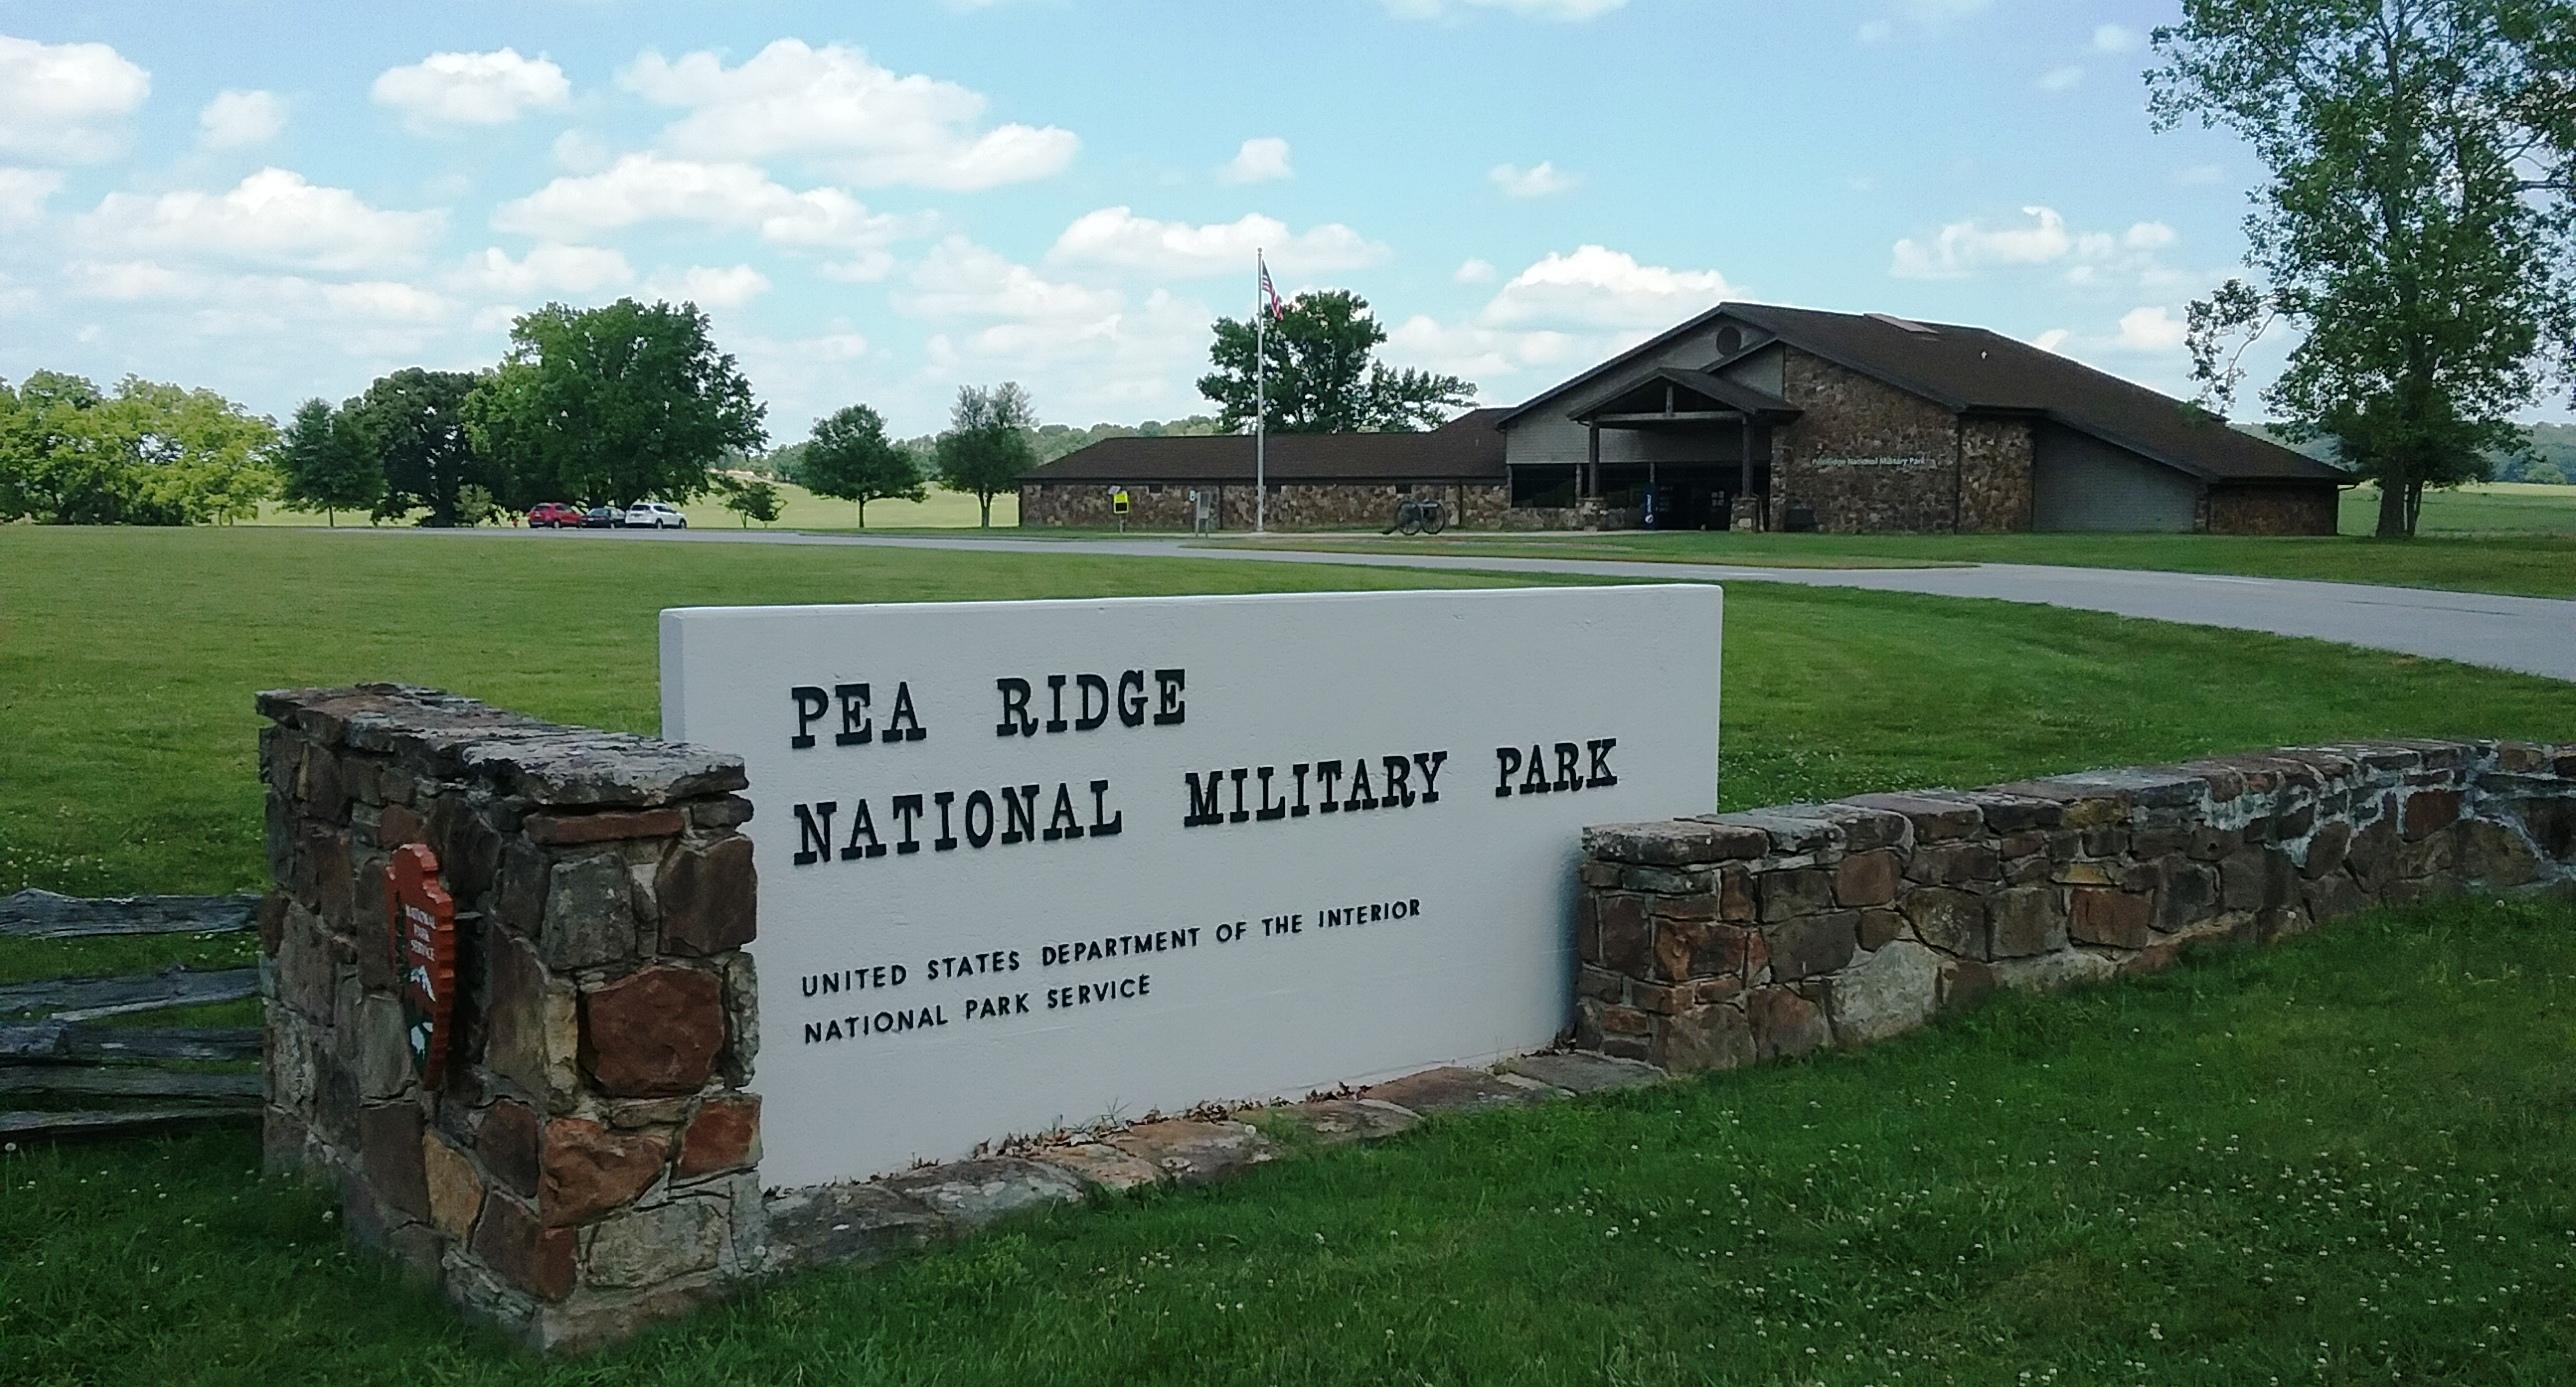 Pea Ridge National Park